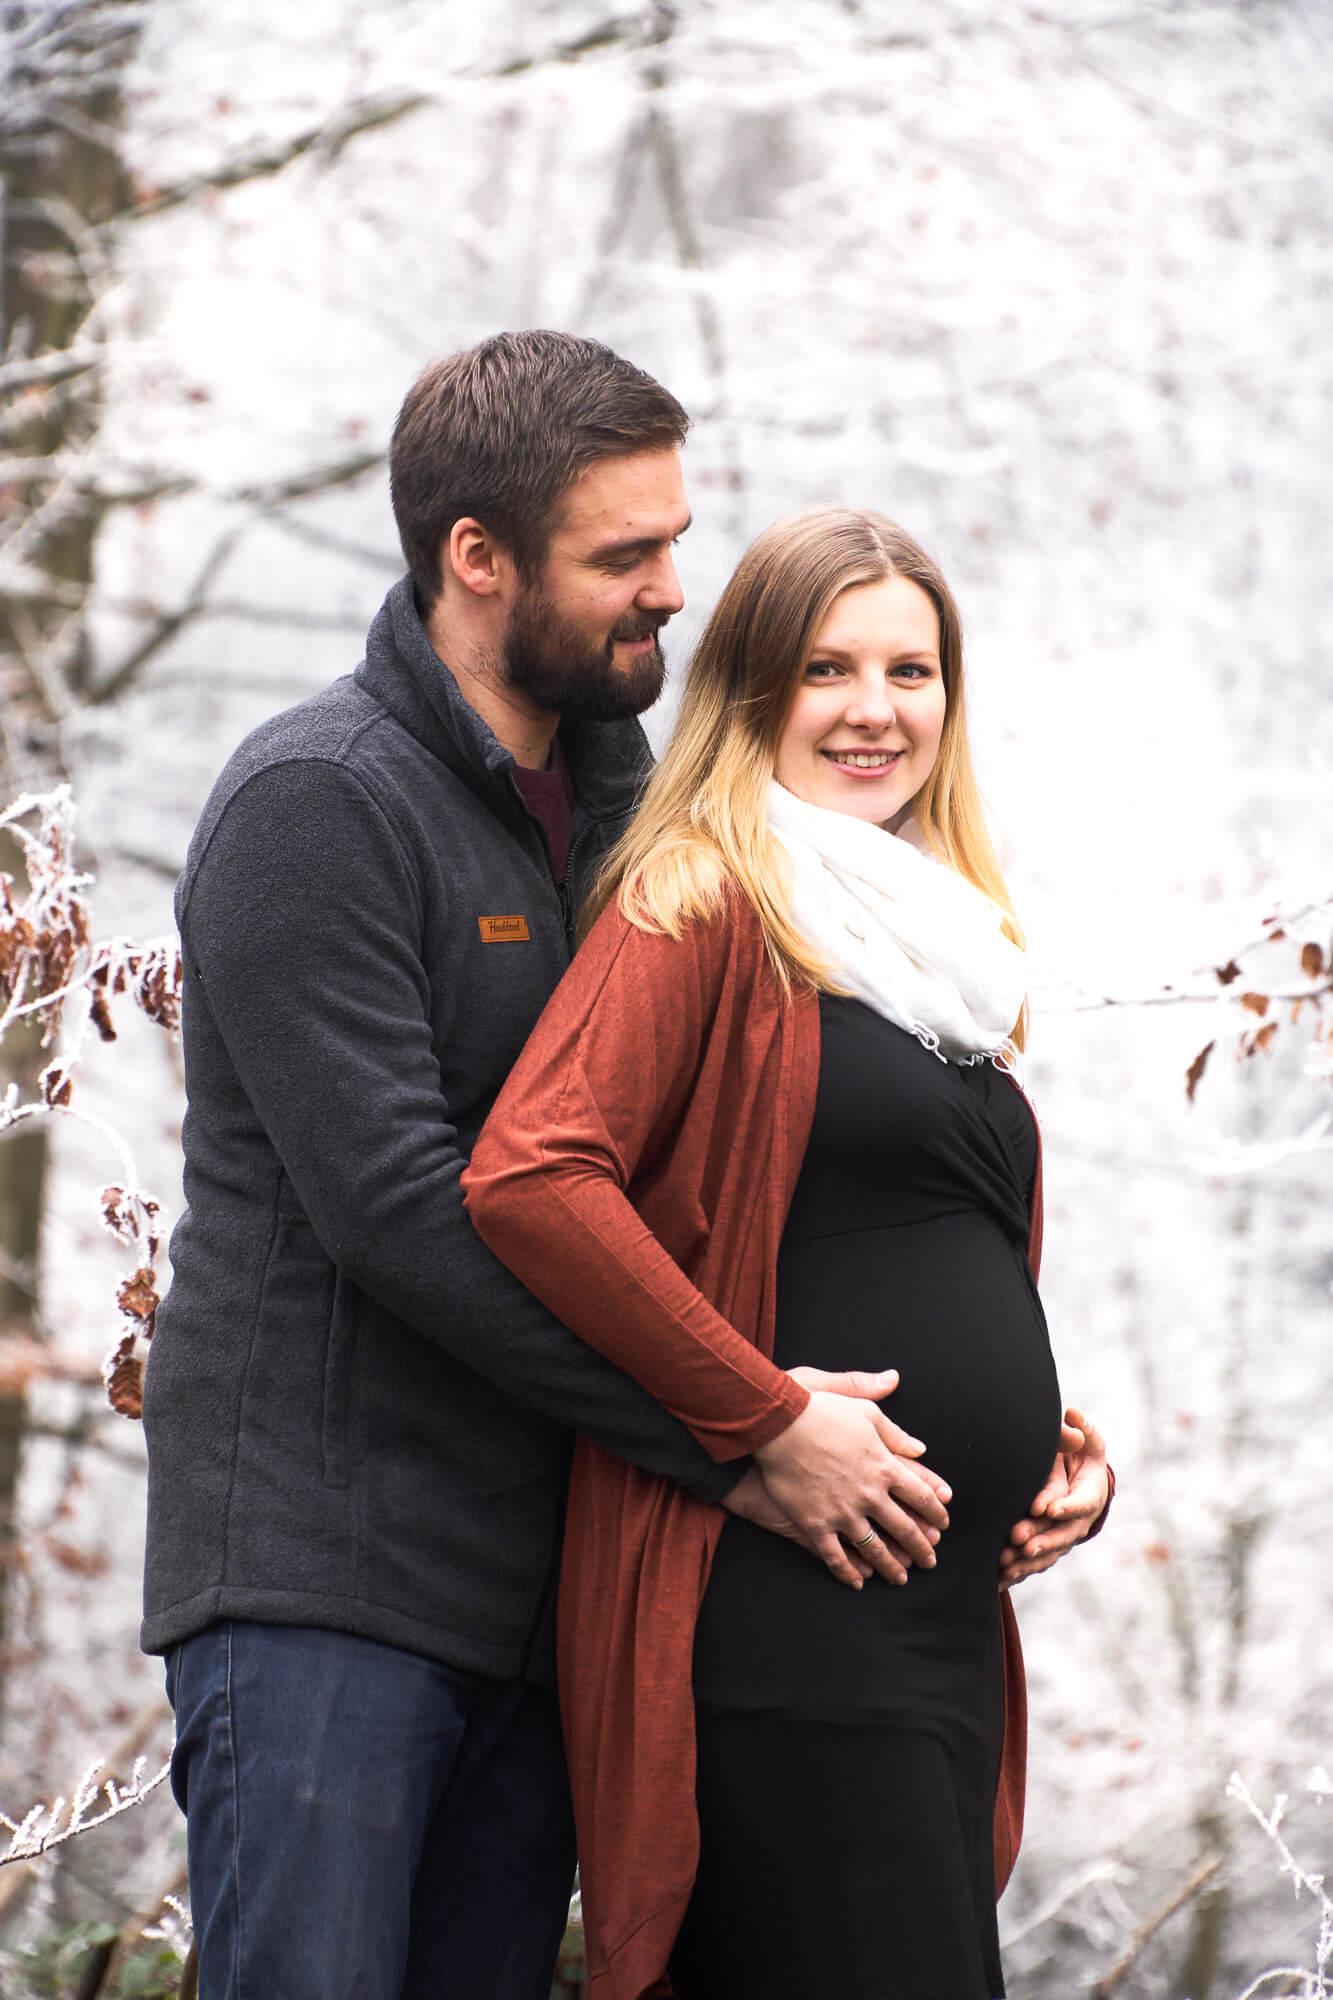 Mann hält den Bauch seiner schwangeren Frau